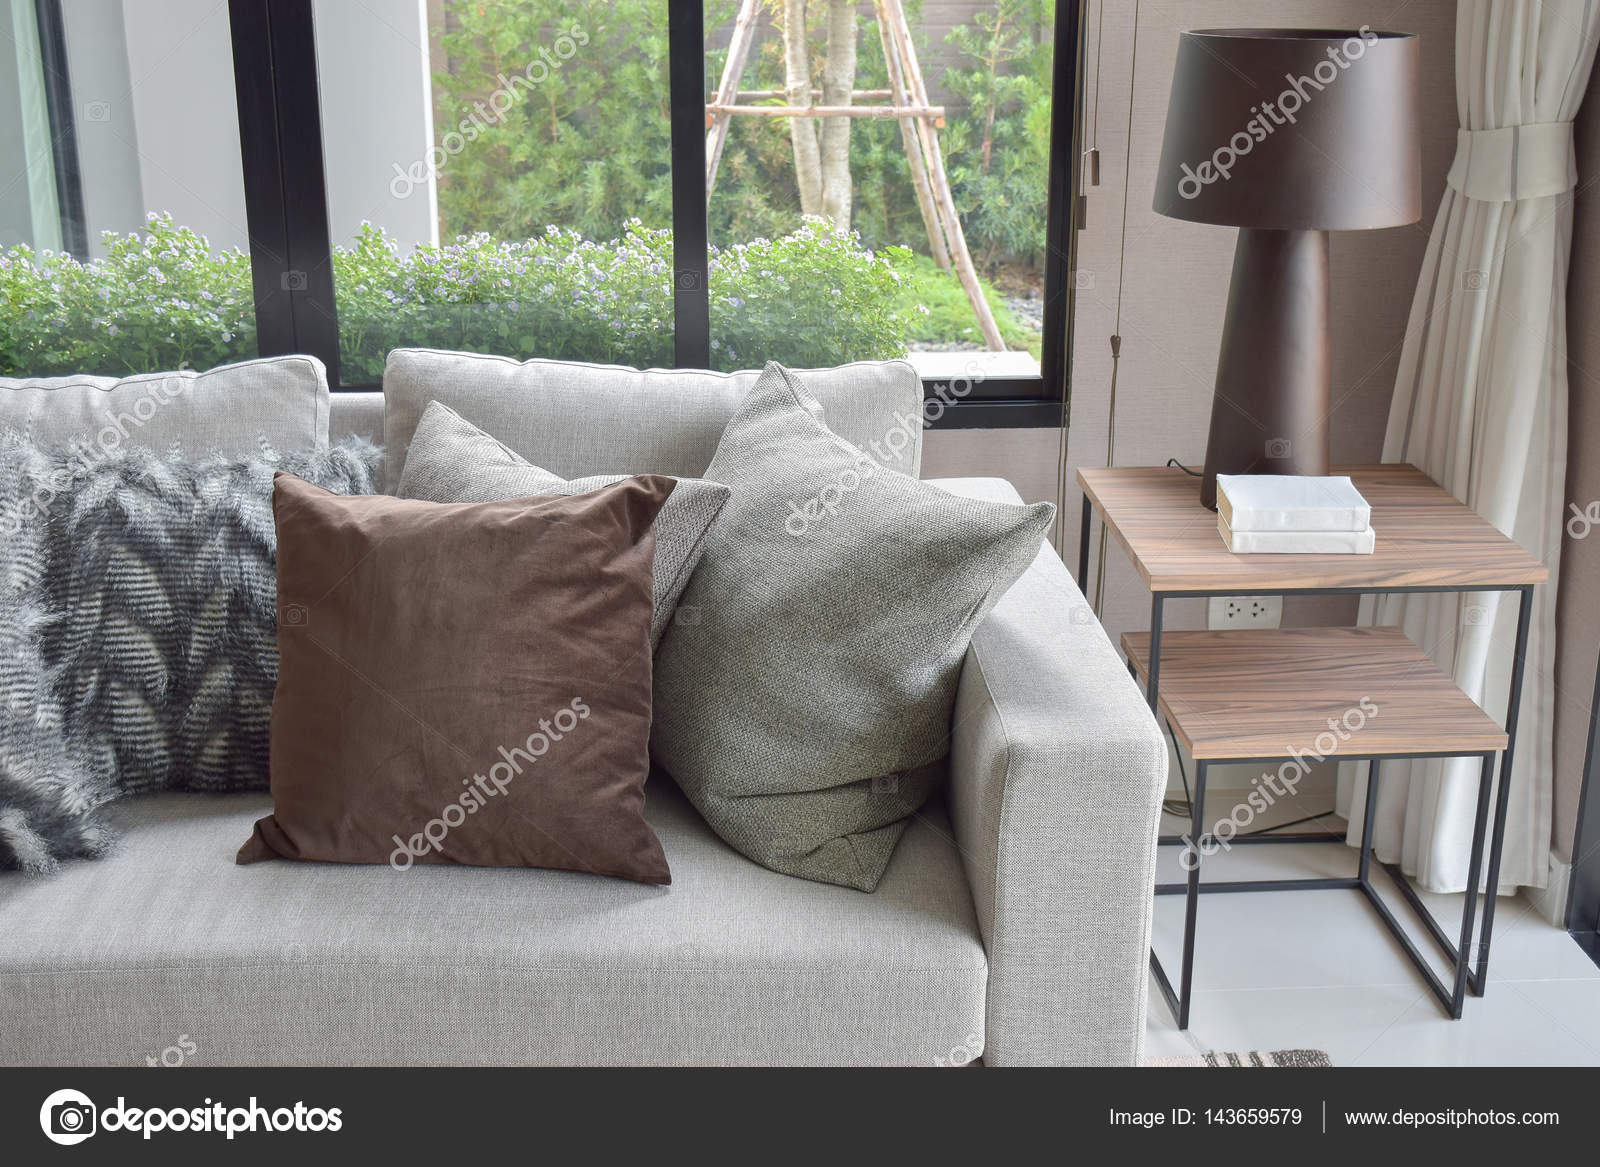 https://st3.depositphotos.com/6200870/14365/i/1600/depositphotos_143659579-stockafbeelding-bruin-en-licht-grijze-kussens.jpg